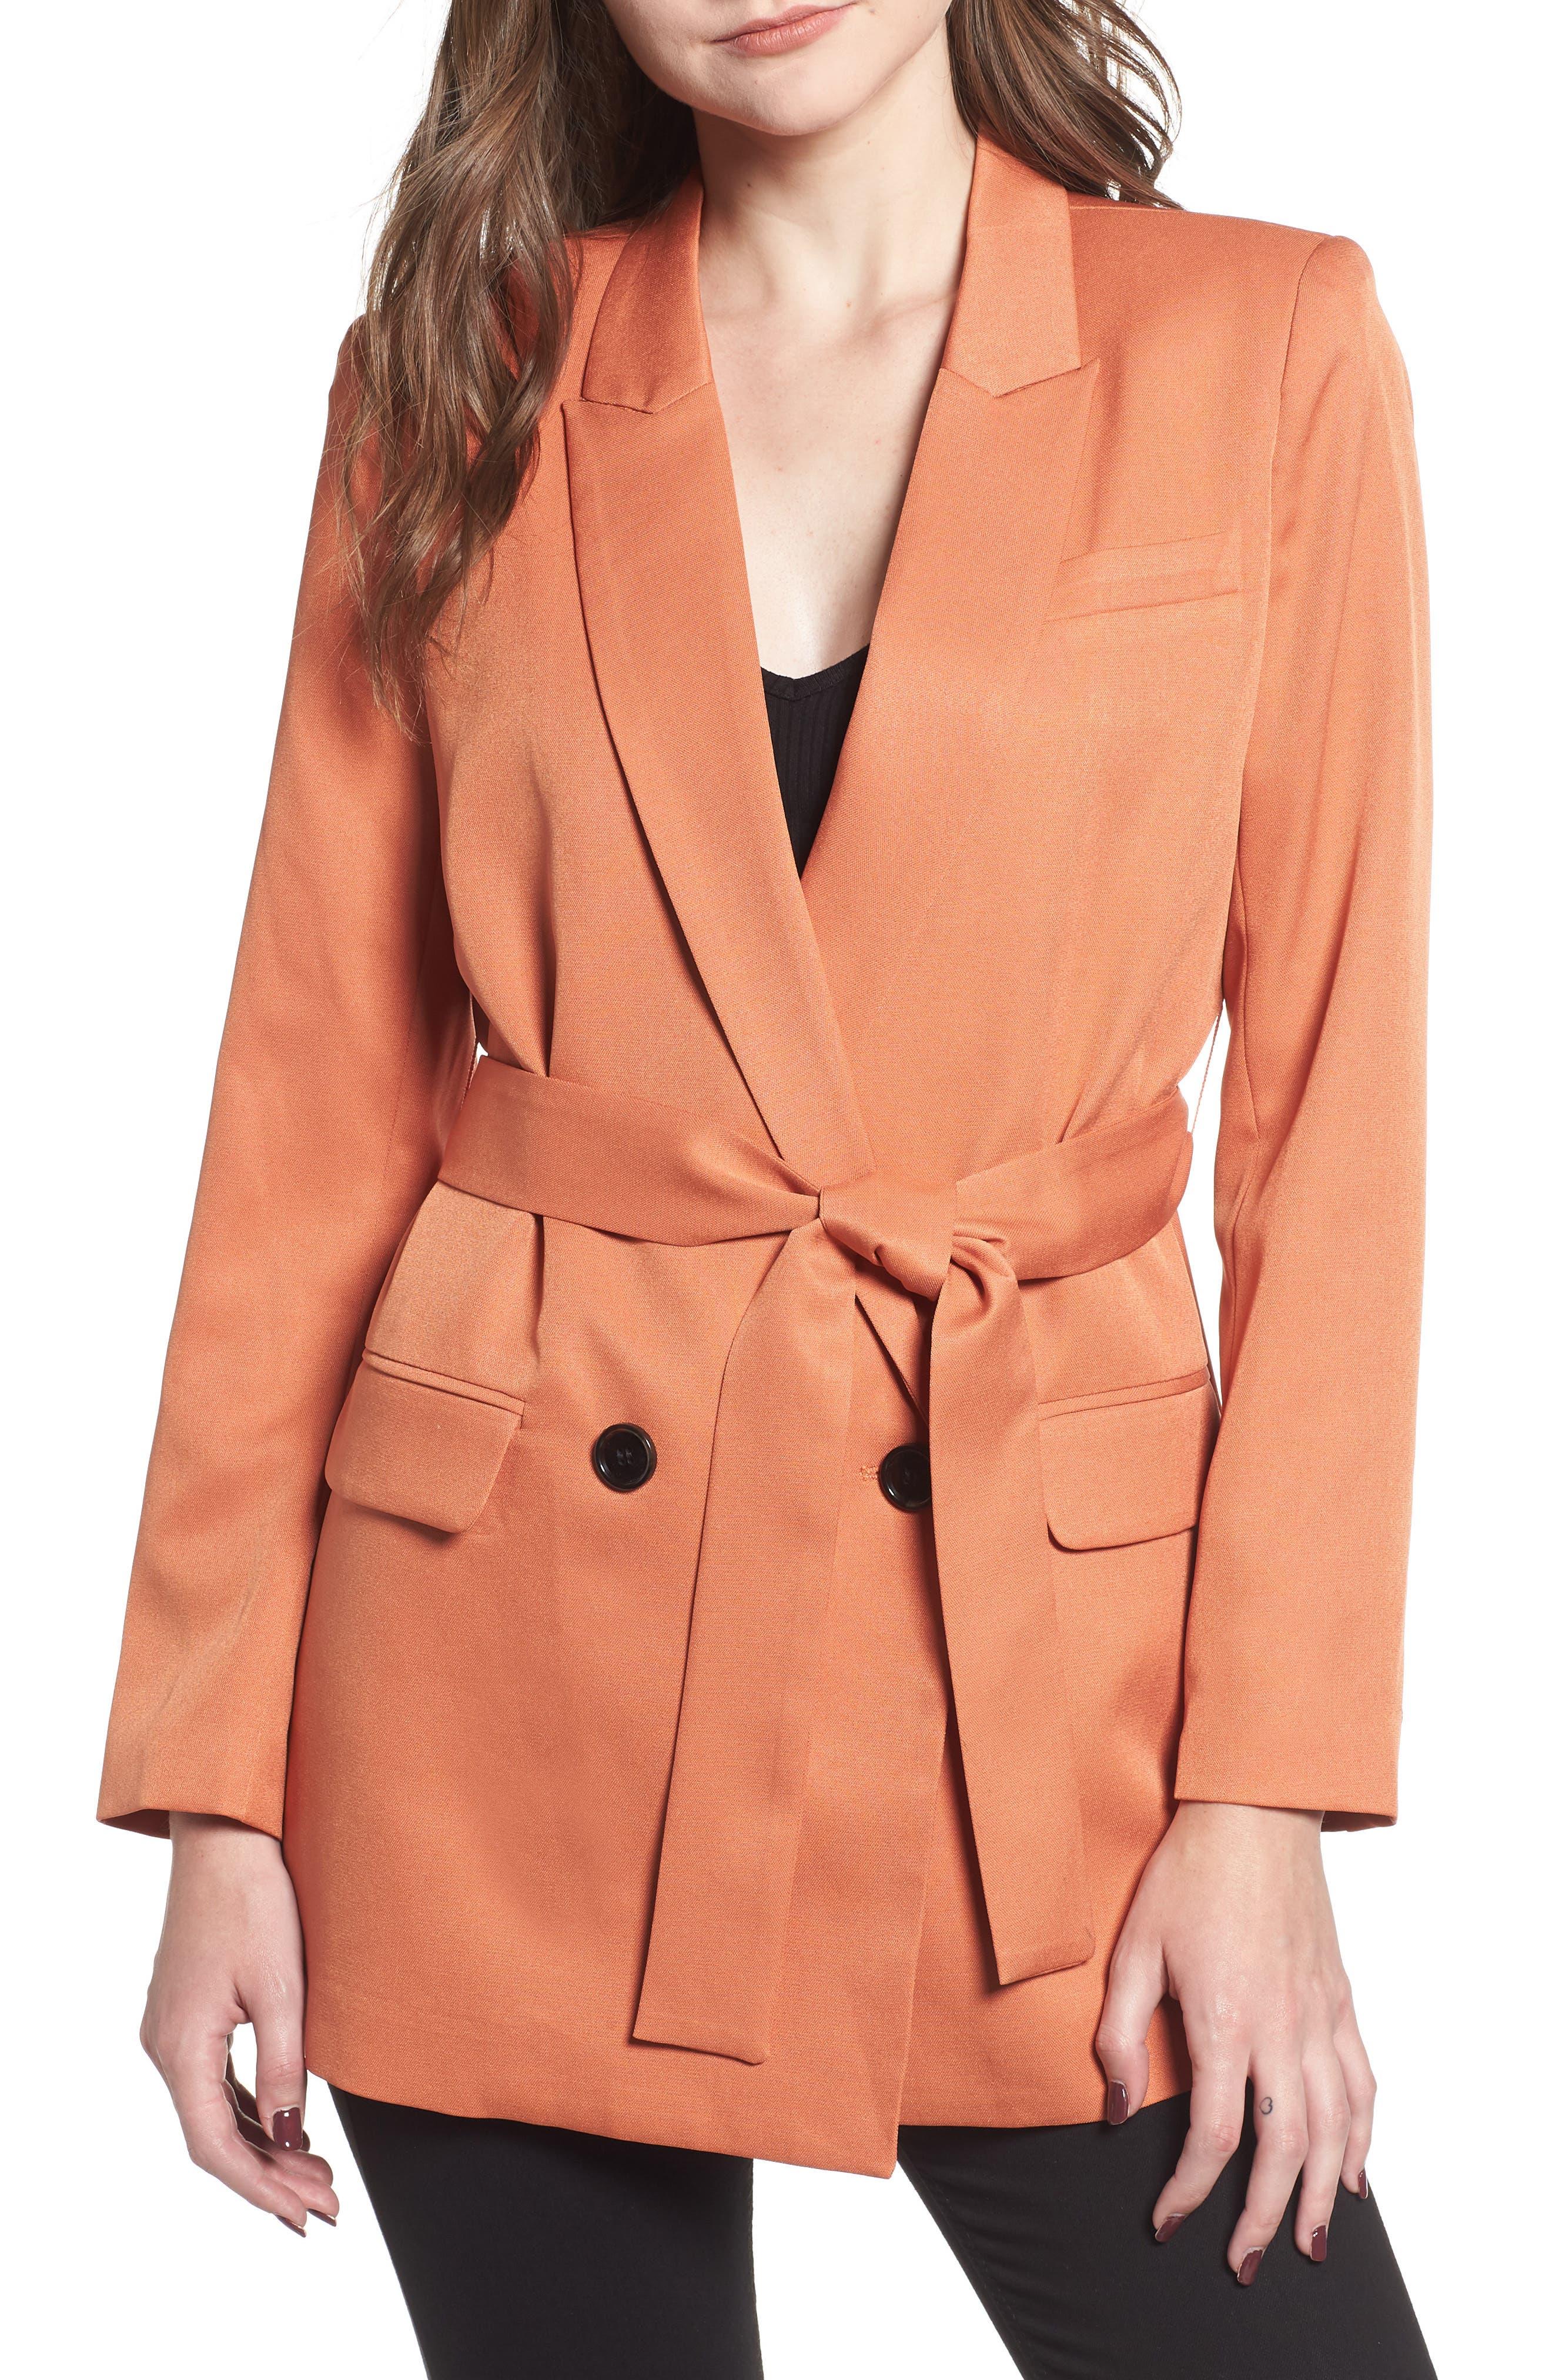 MURAL Belted Blazer, Main, color, 200